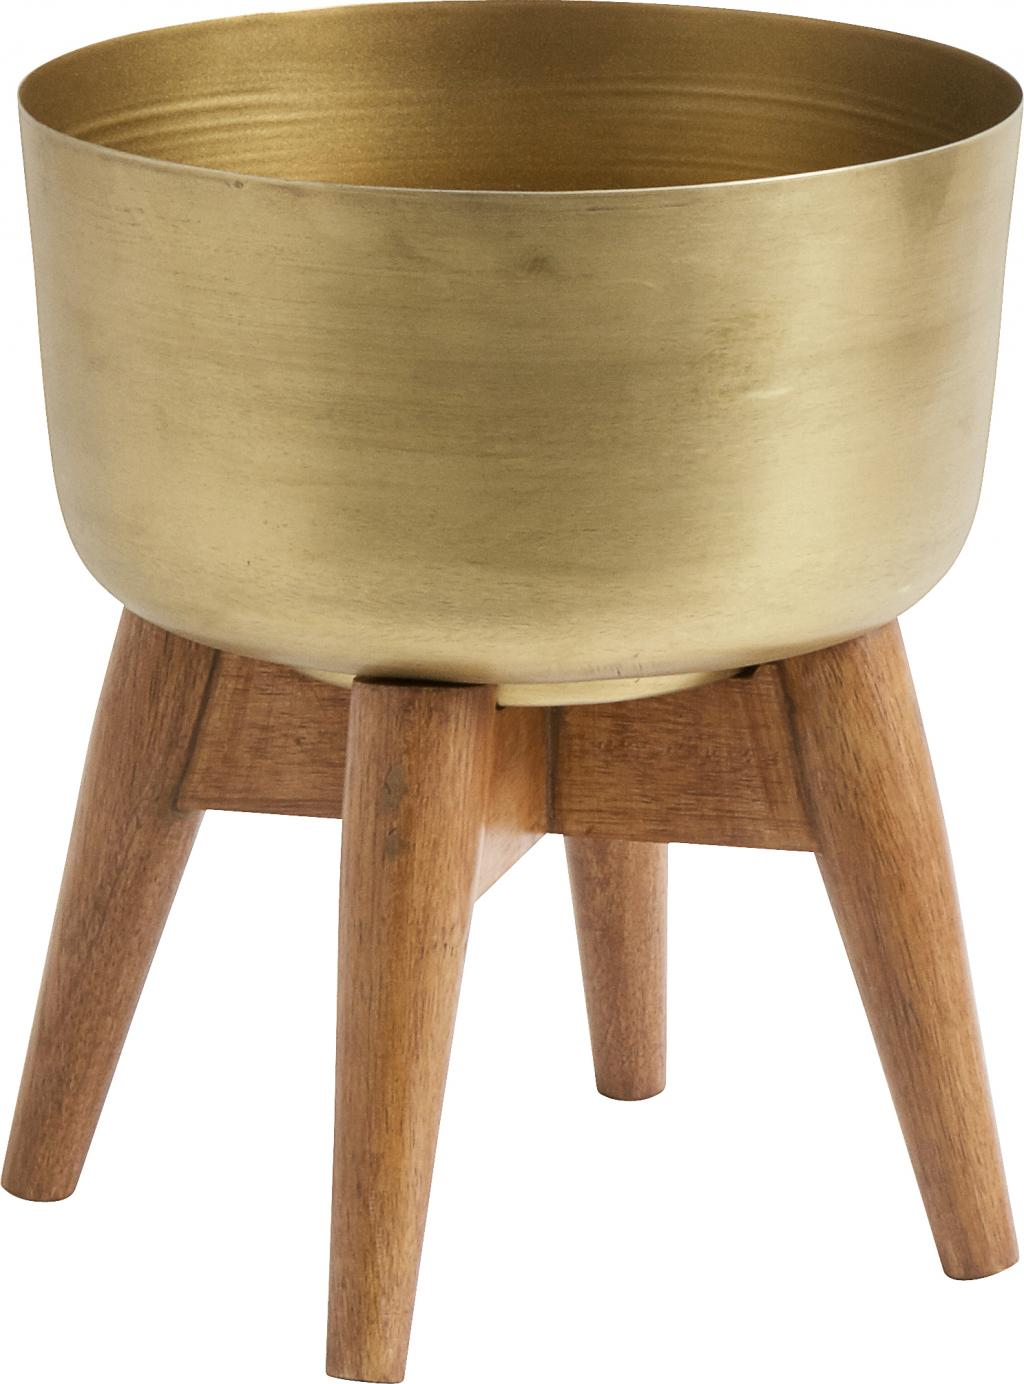 plantenbak goud 21 x 24 cm mangohout en metaal nordal. Black Bedroom Furniture Sets. Home Design Ideas